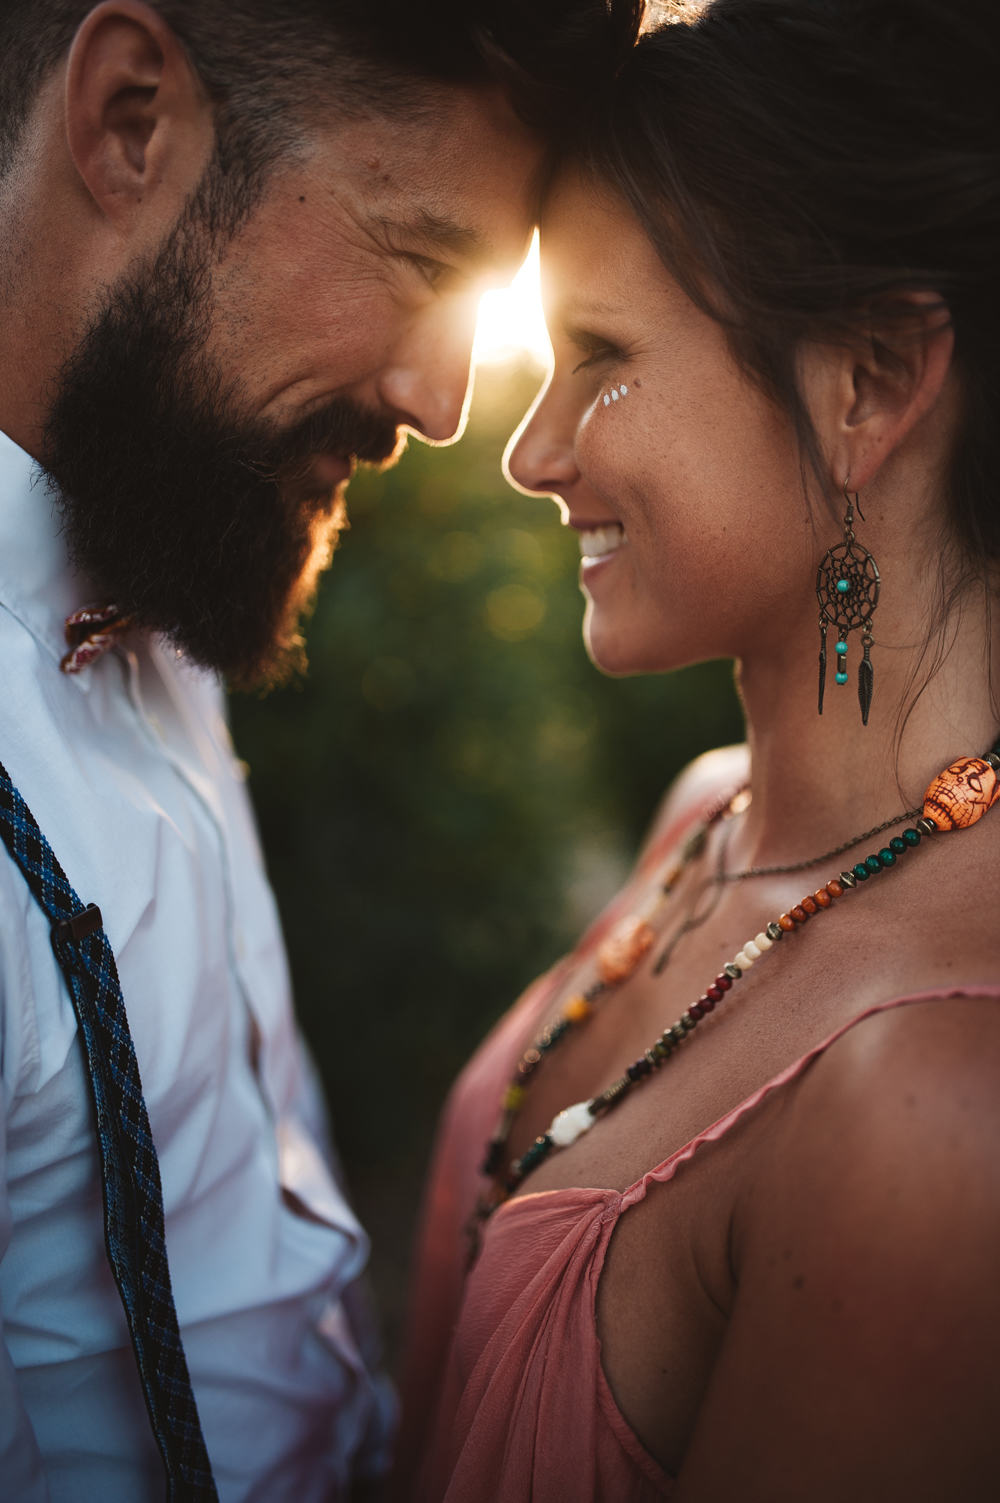 melanie-bultez-photographe-mariage-provence-wedding-photographer-aix-montpellier-folk-ethnique-97